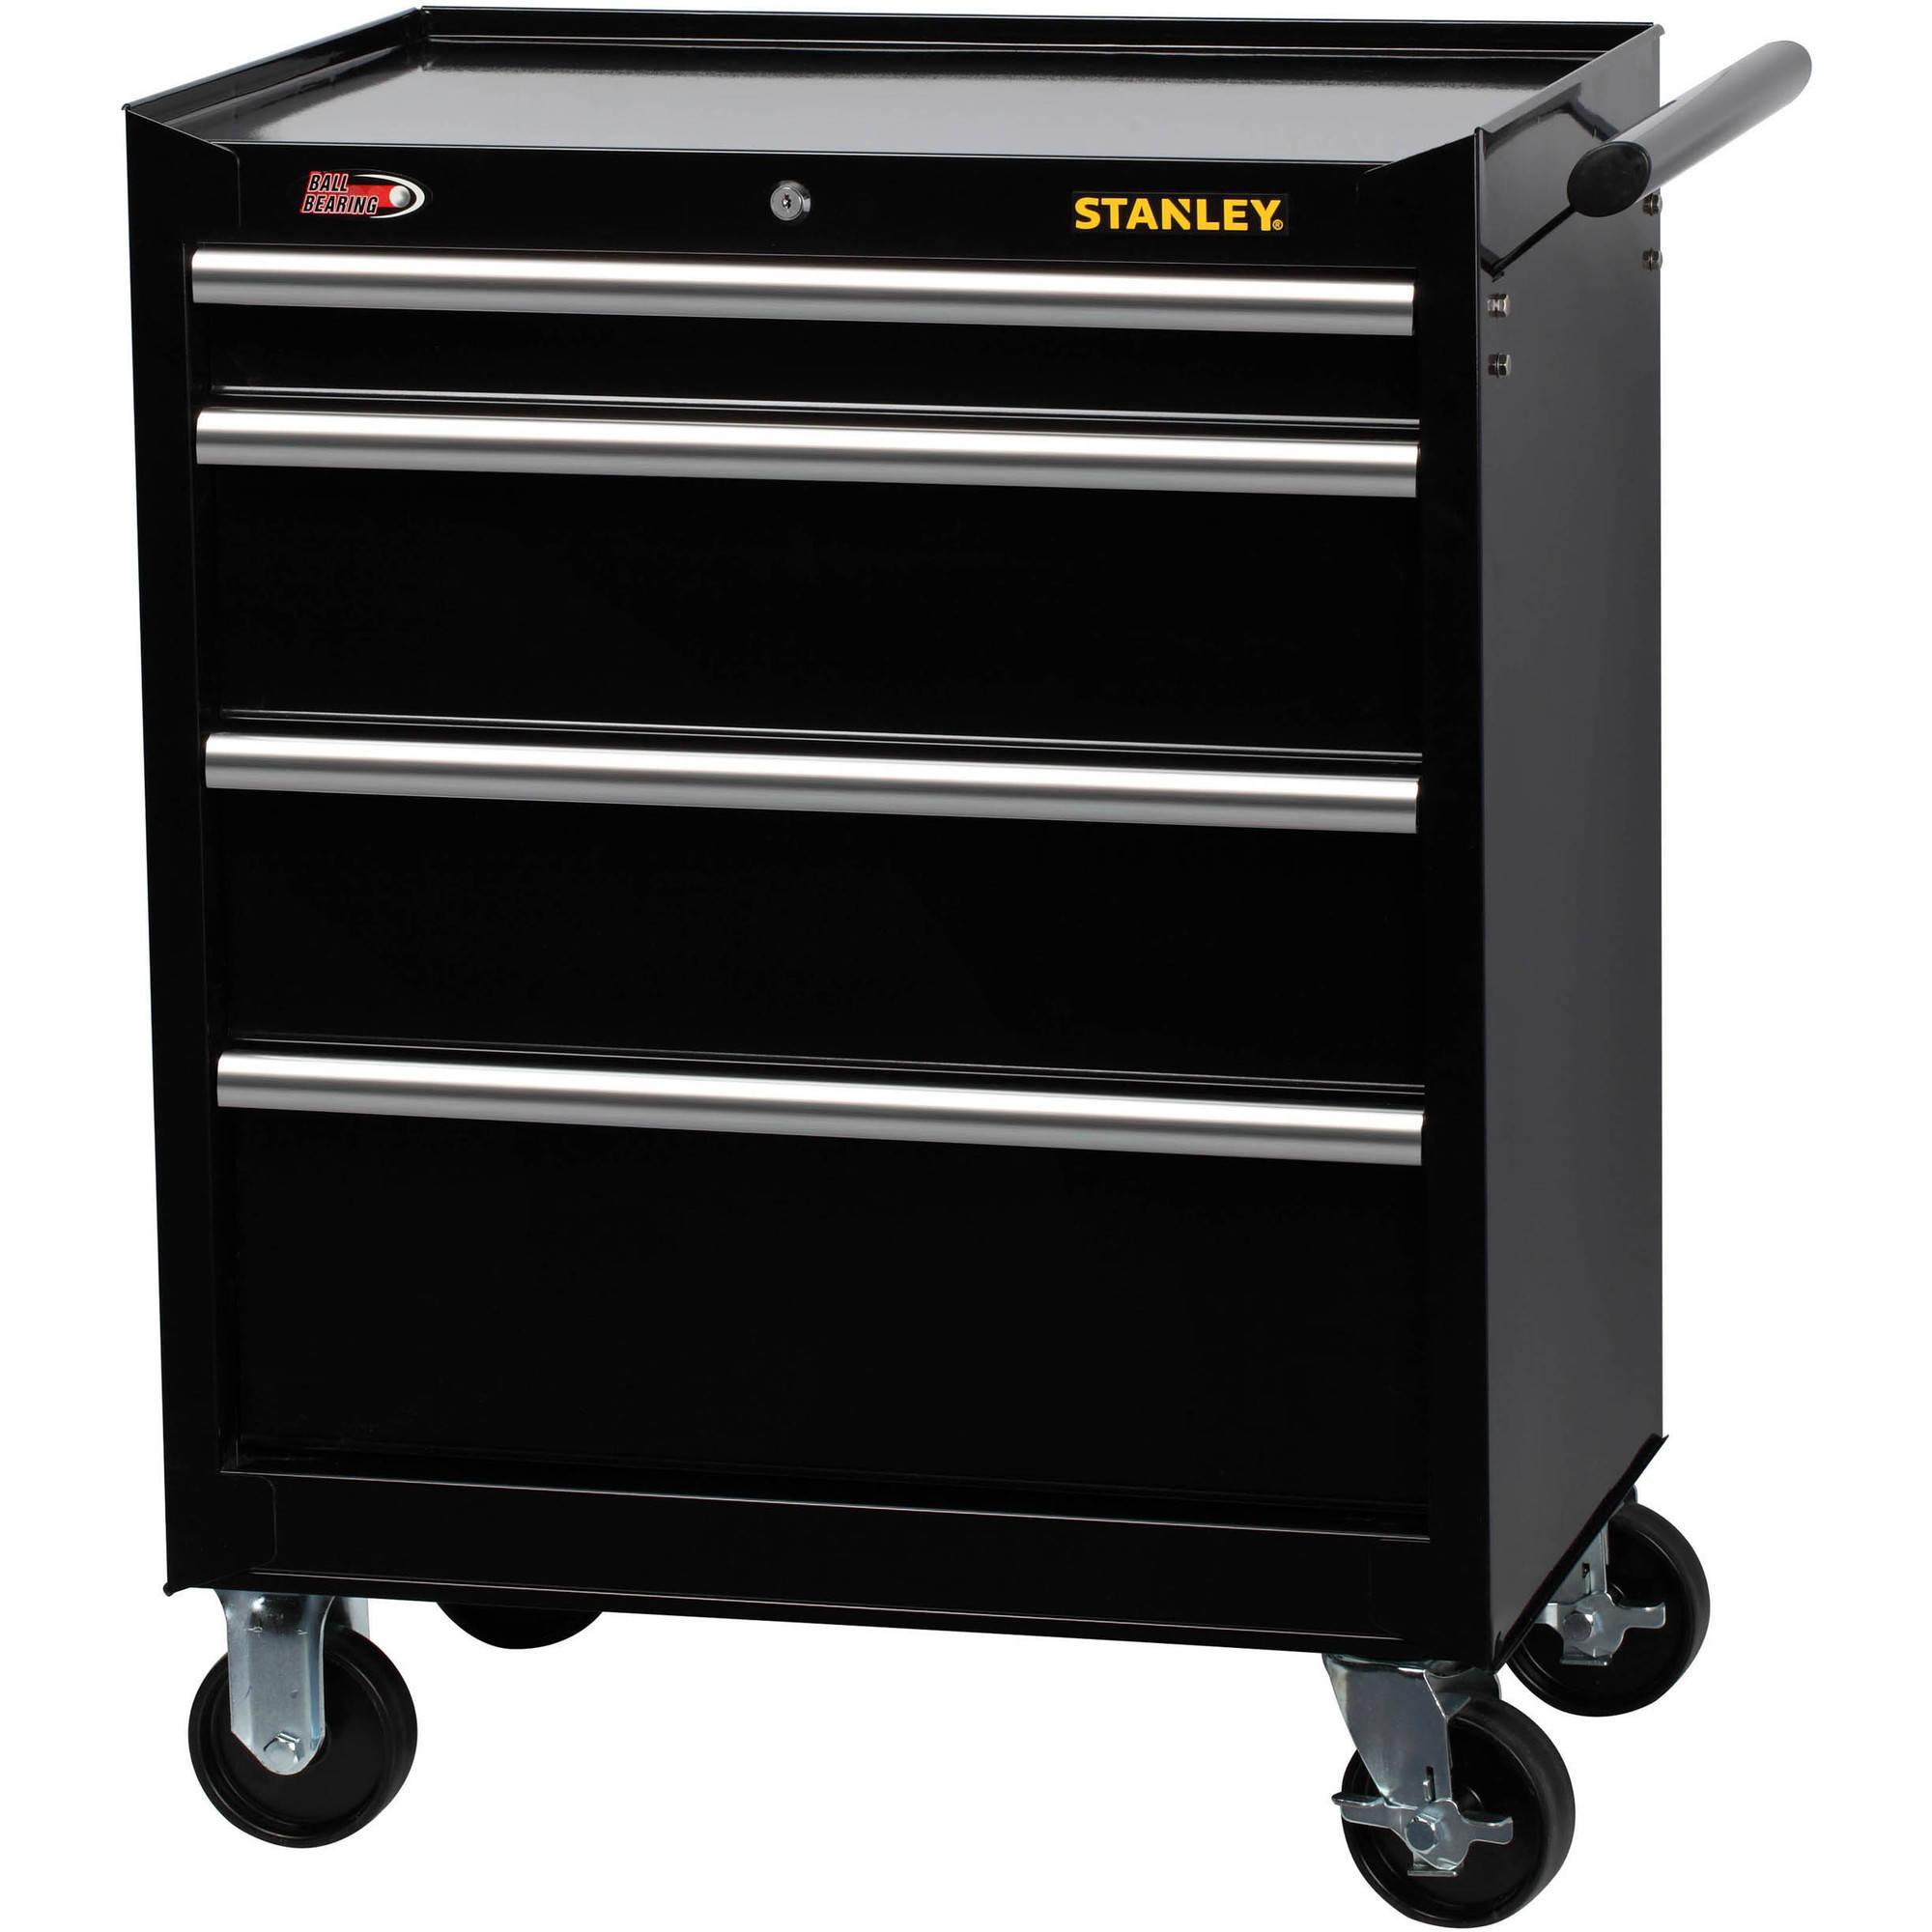 Stanley 4-Drawer Cabinet, Black